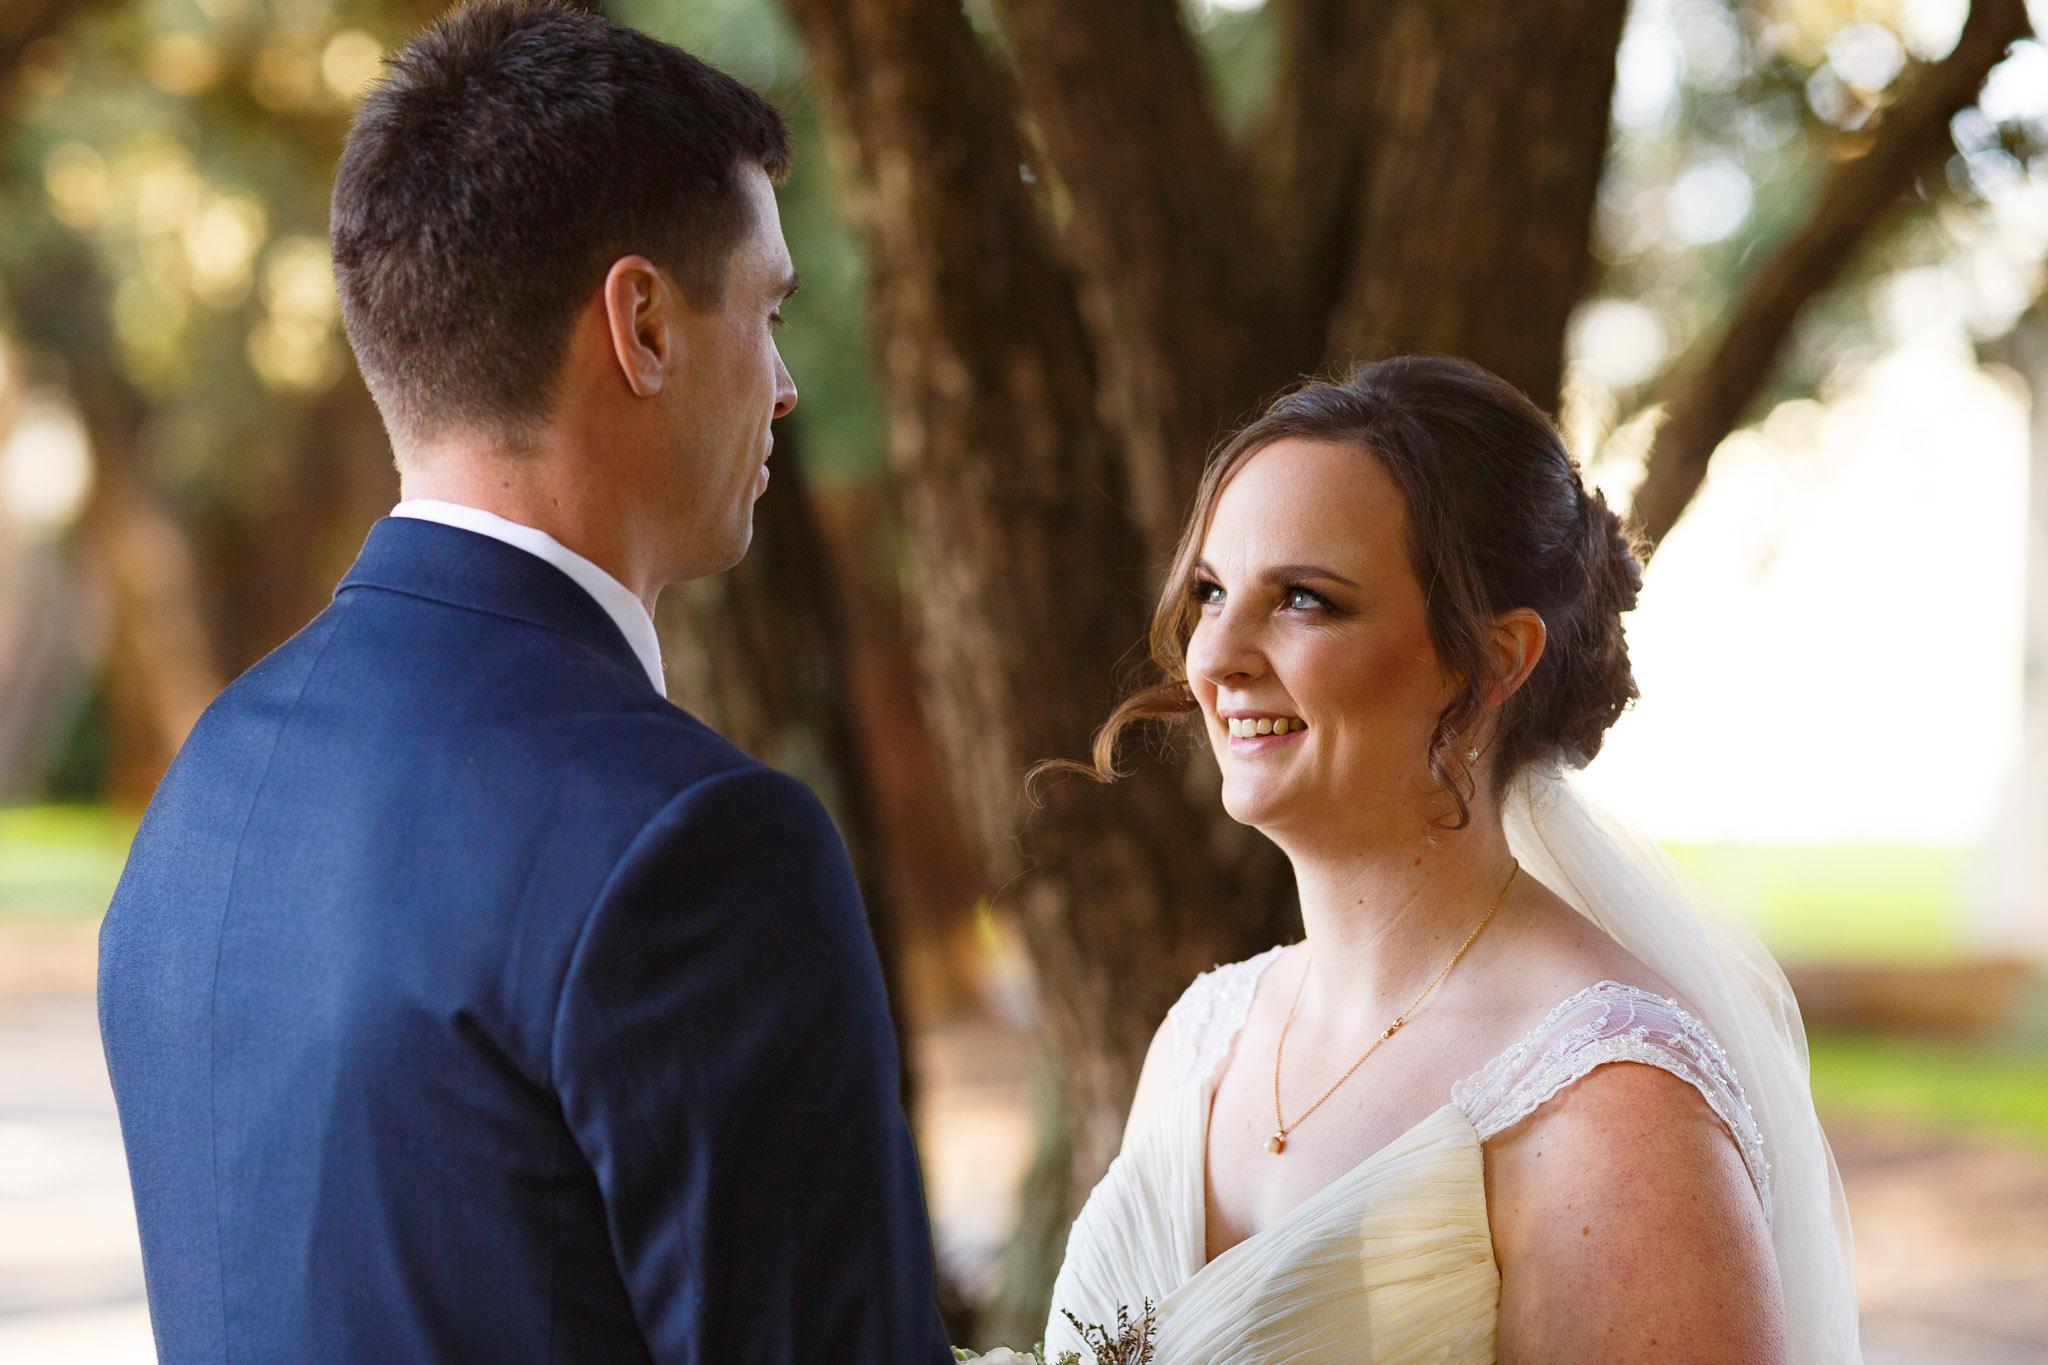 highlight_wedding_photography_manawatu_palmerston_north_new_zealand_rangitikei_golf_ohakea-40.jpg